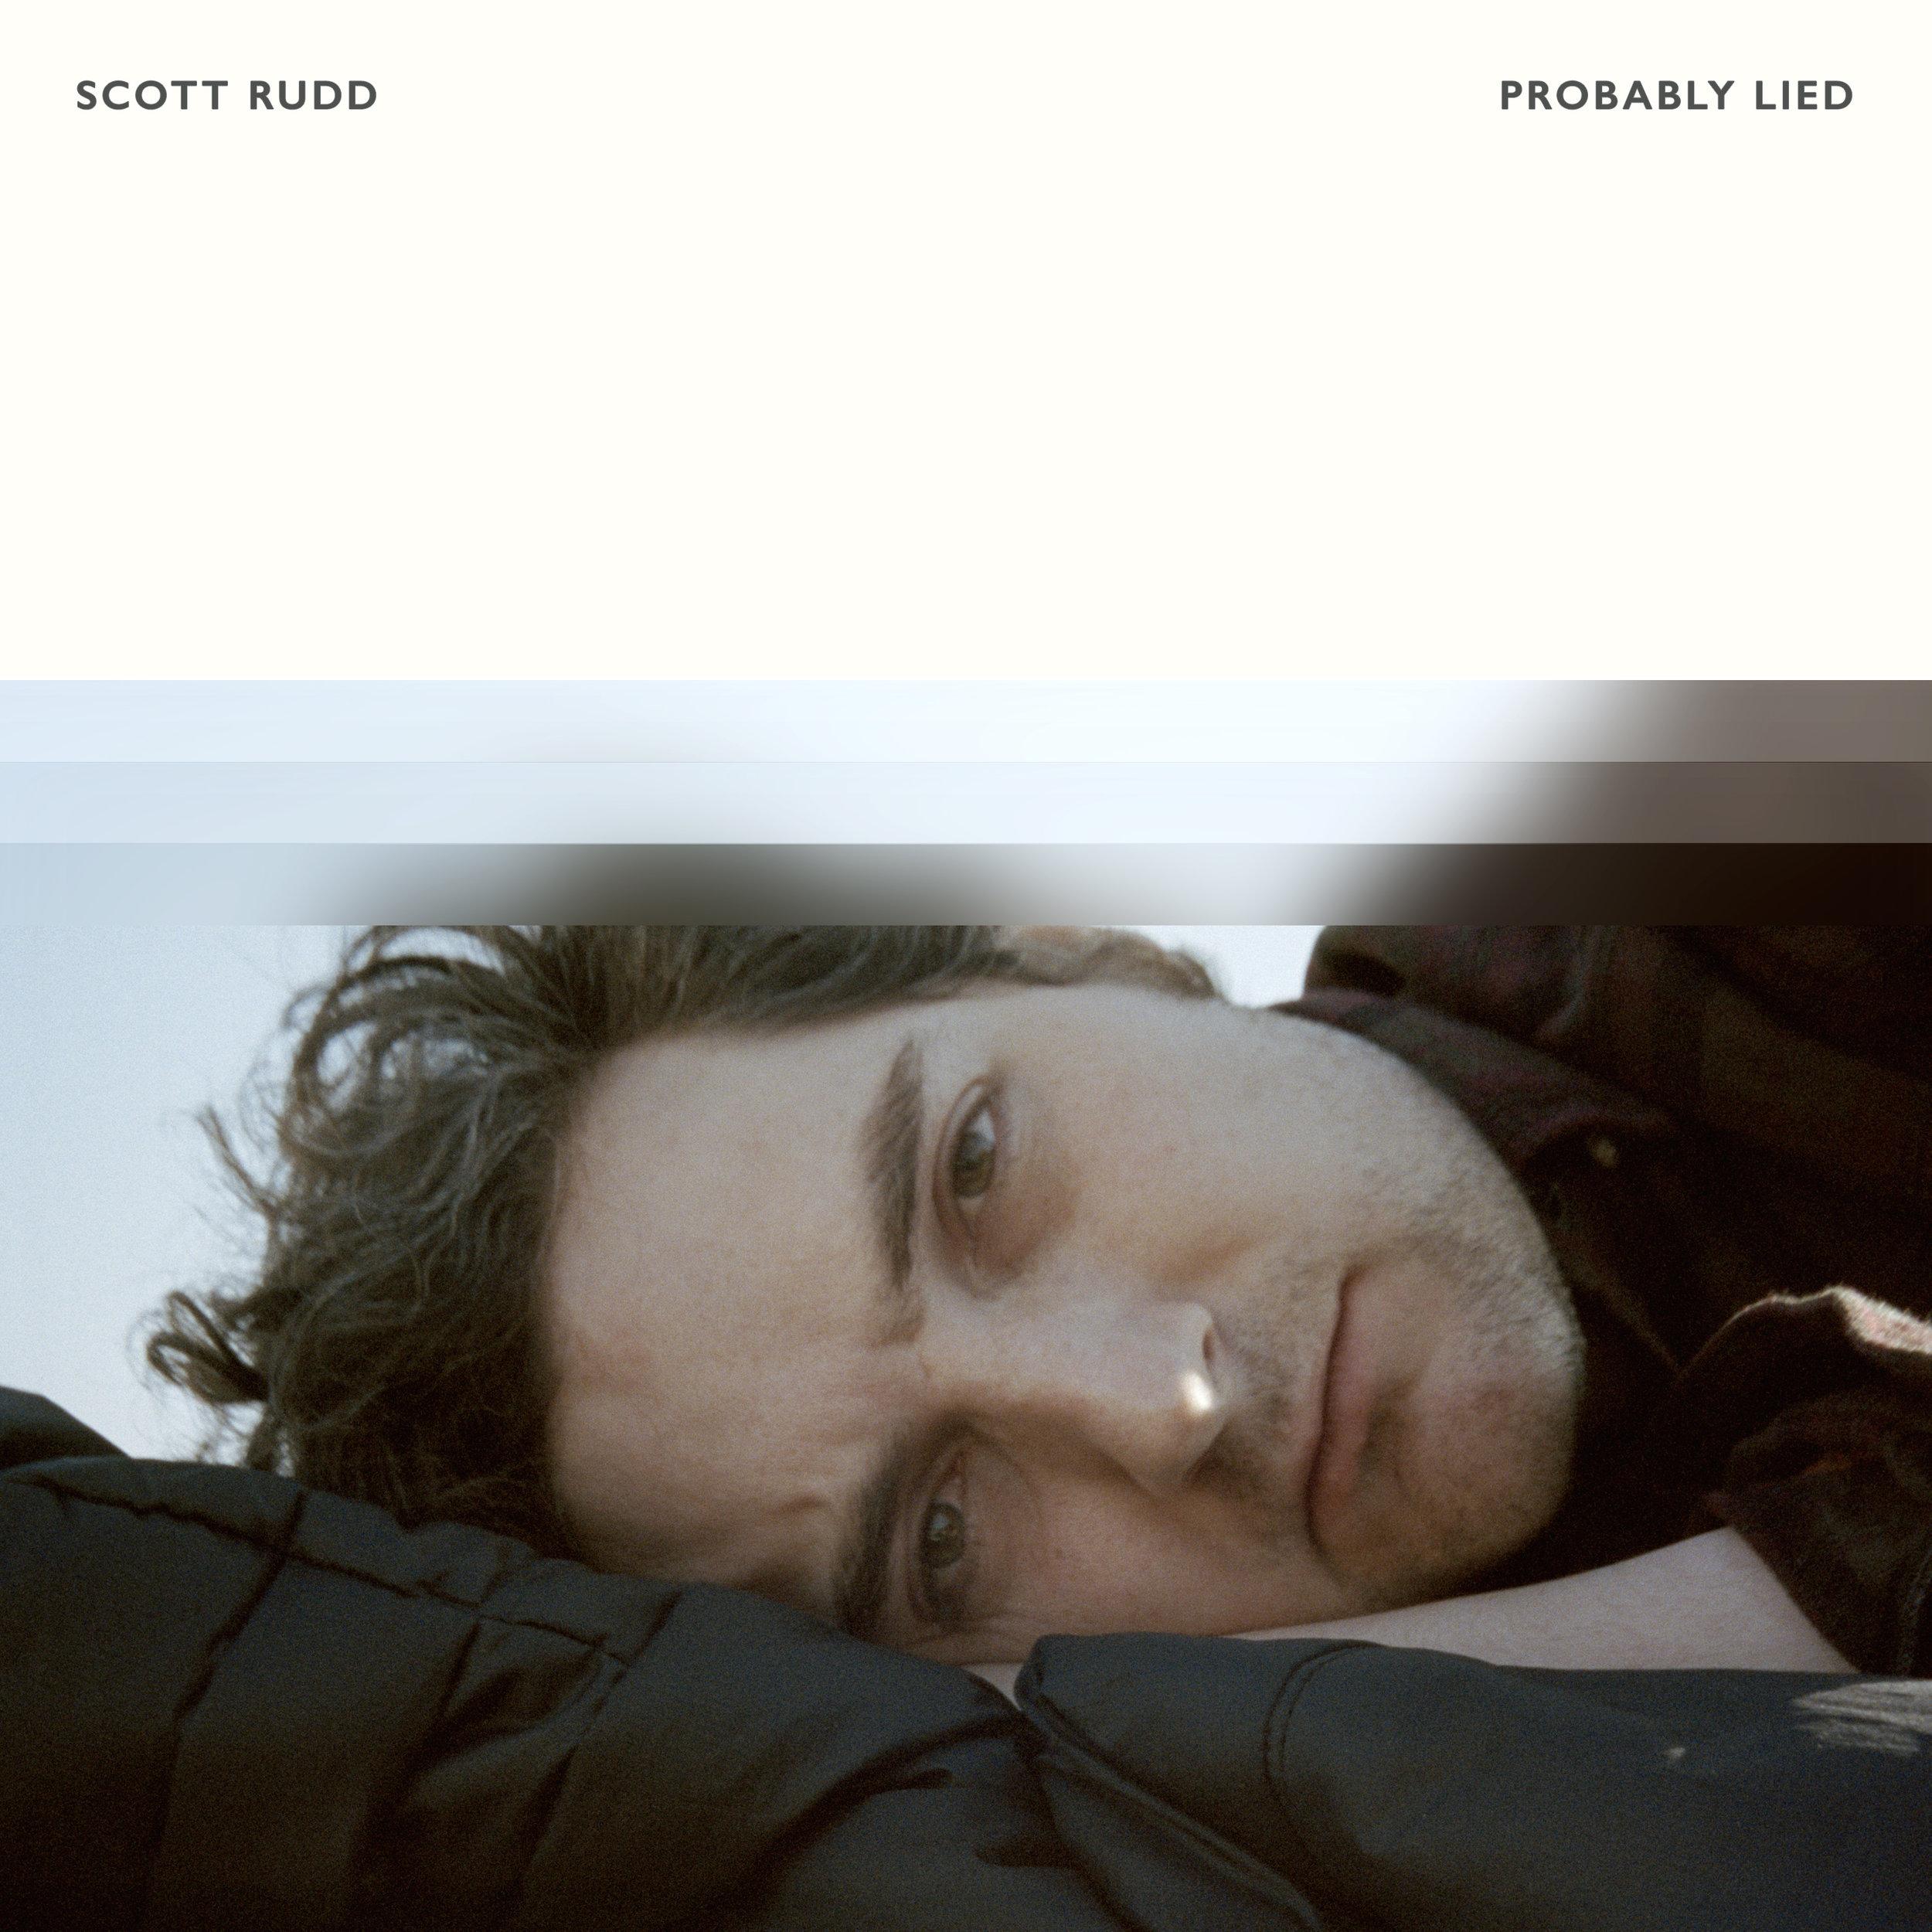 Scott Rudd - Probably Lied